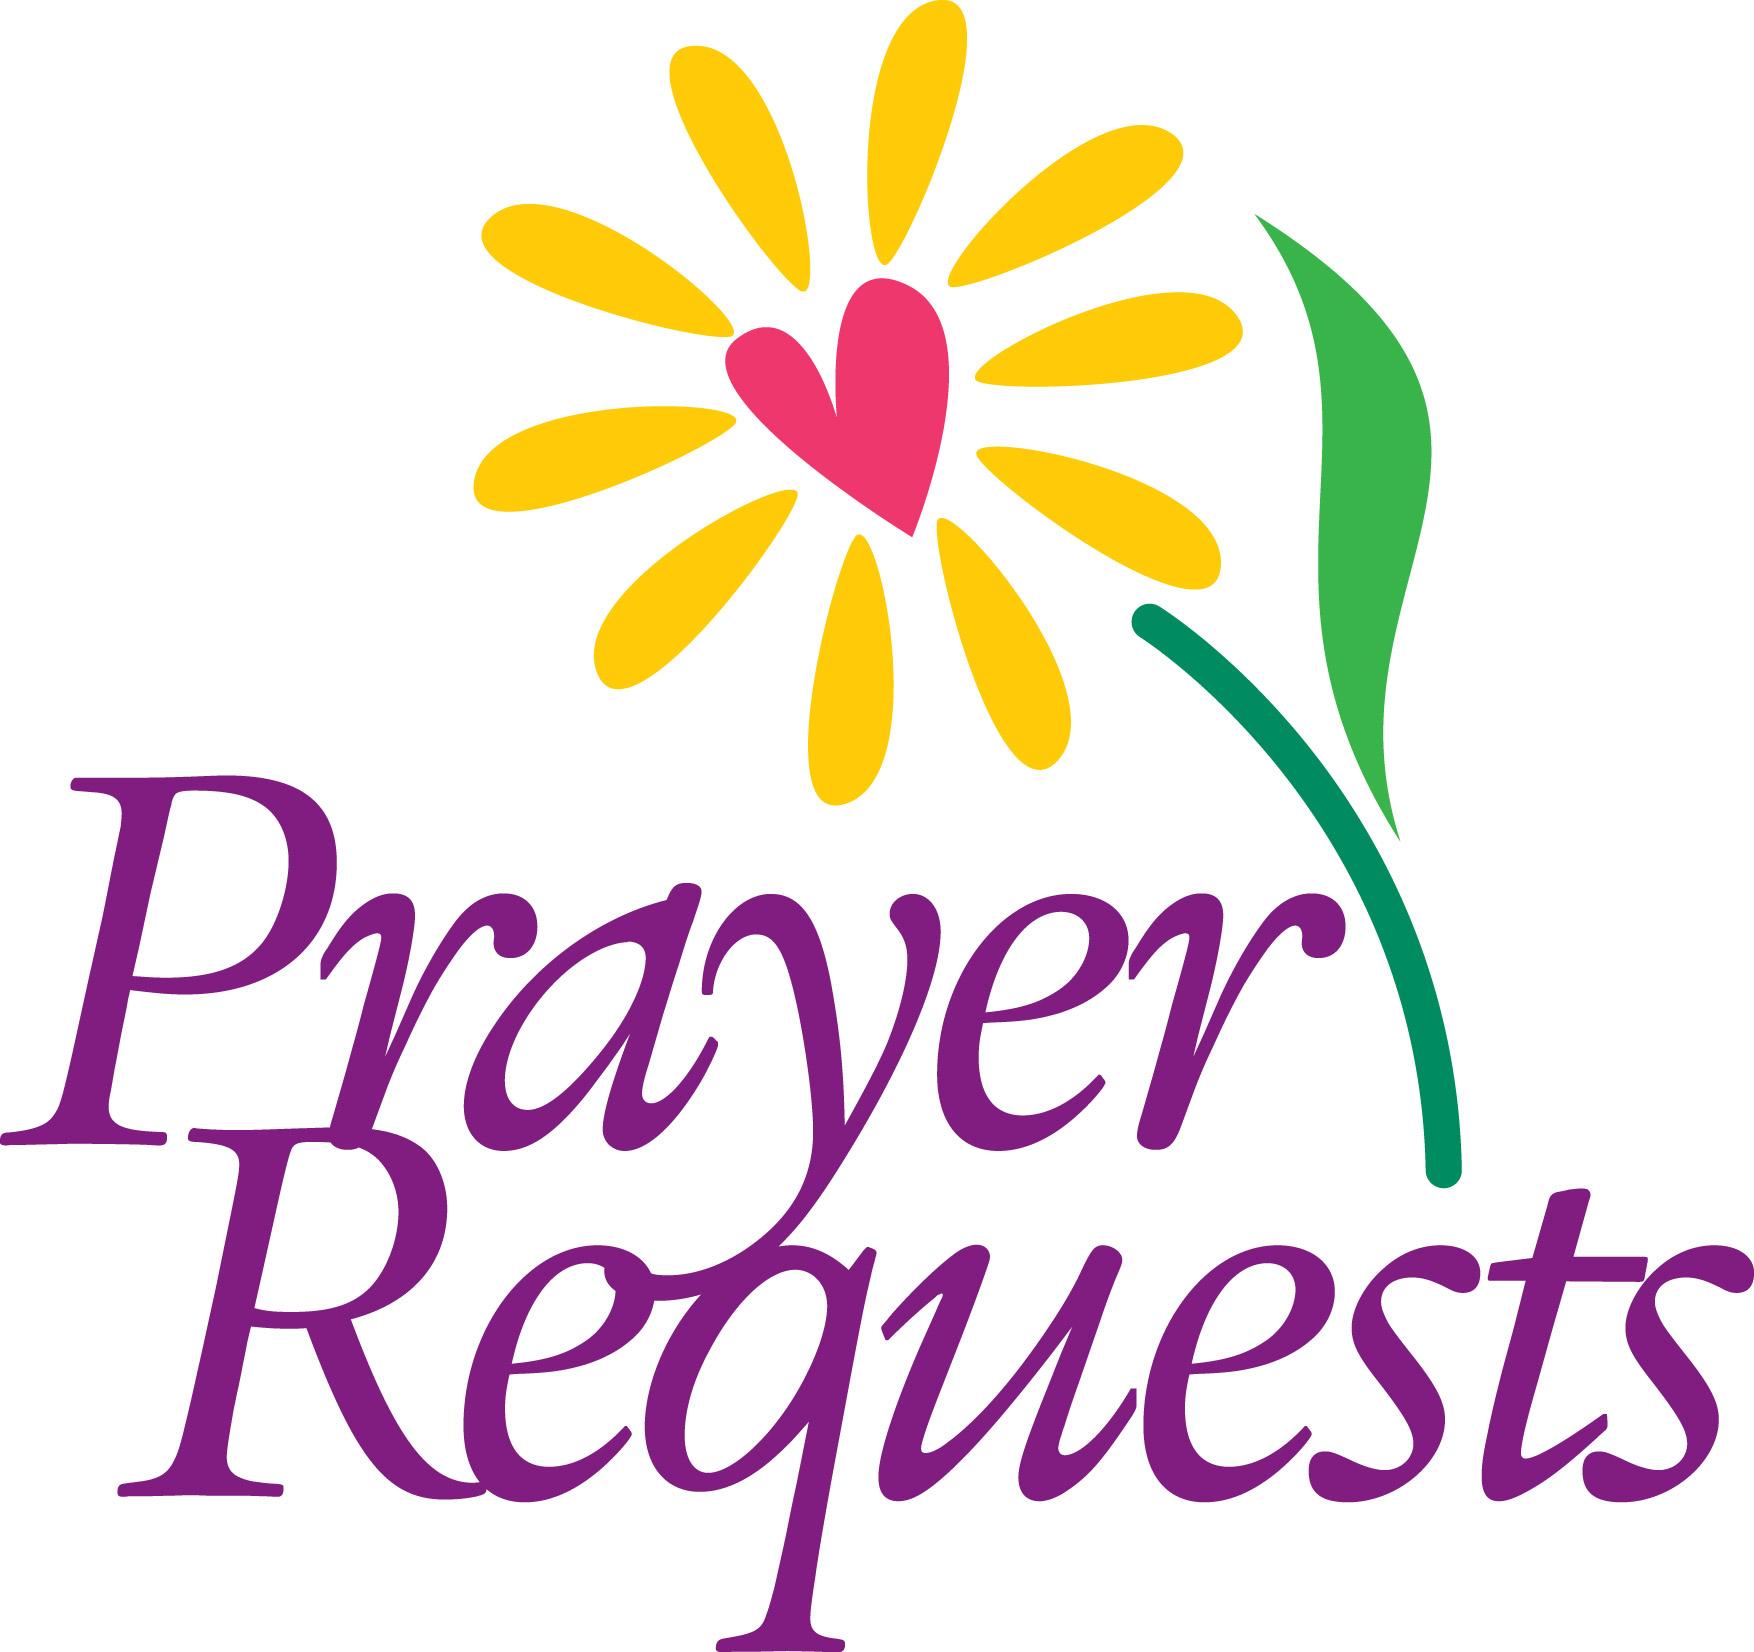 clipart on prayer - photo #8